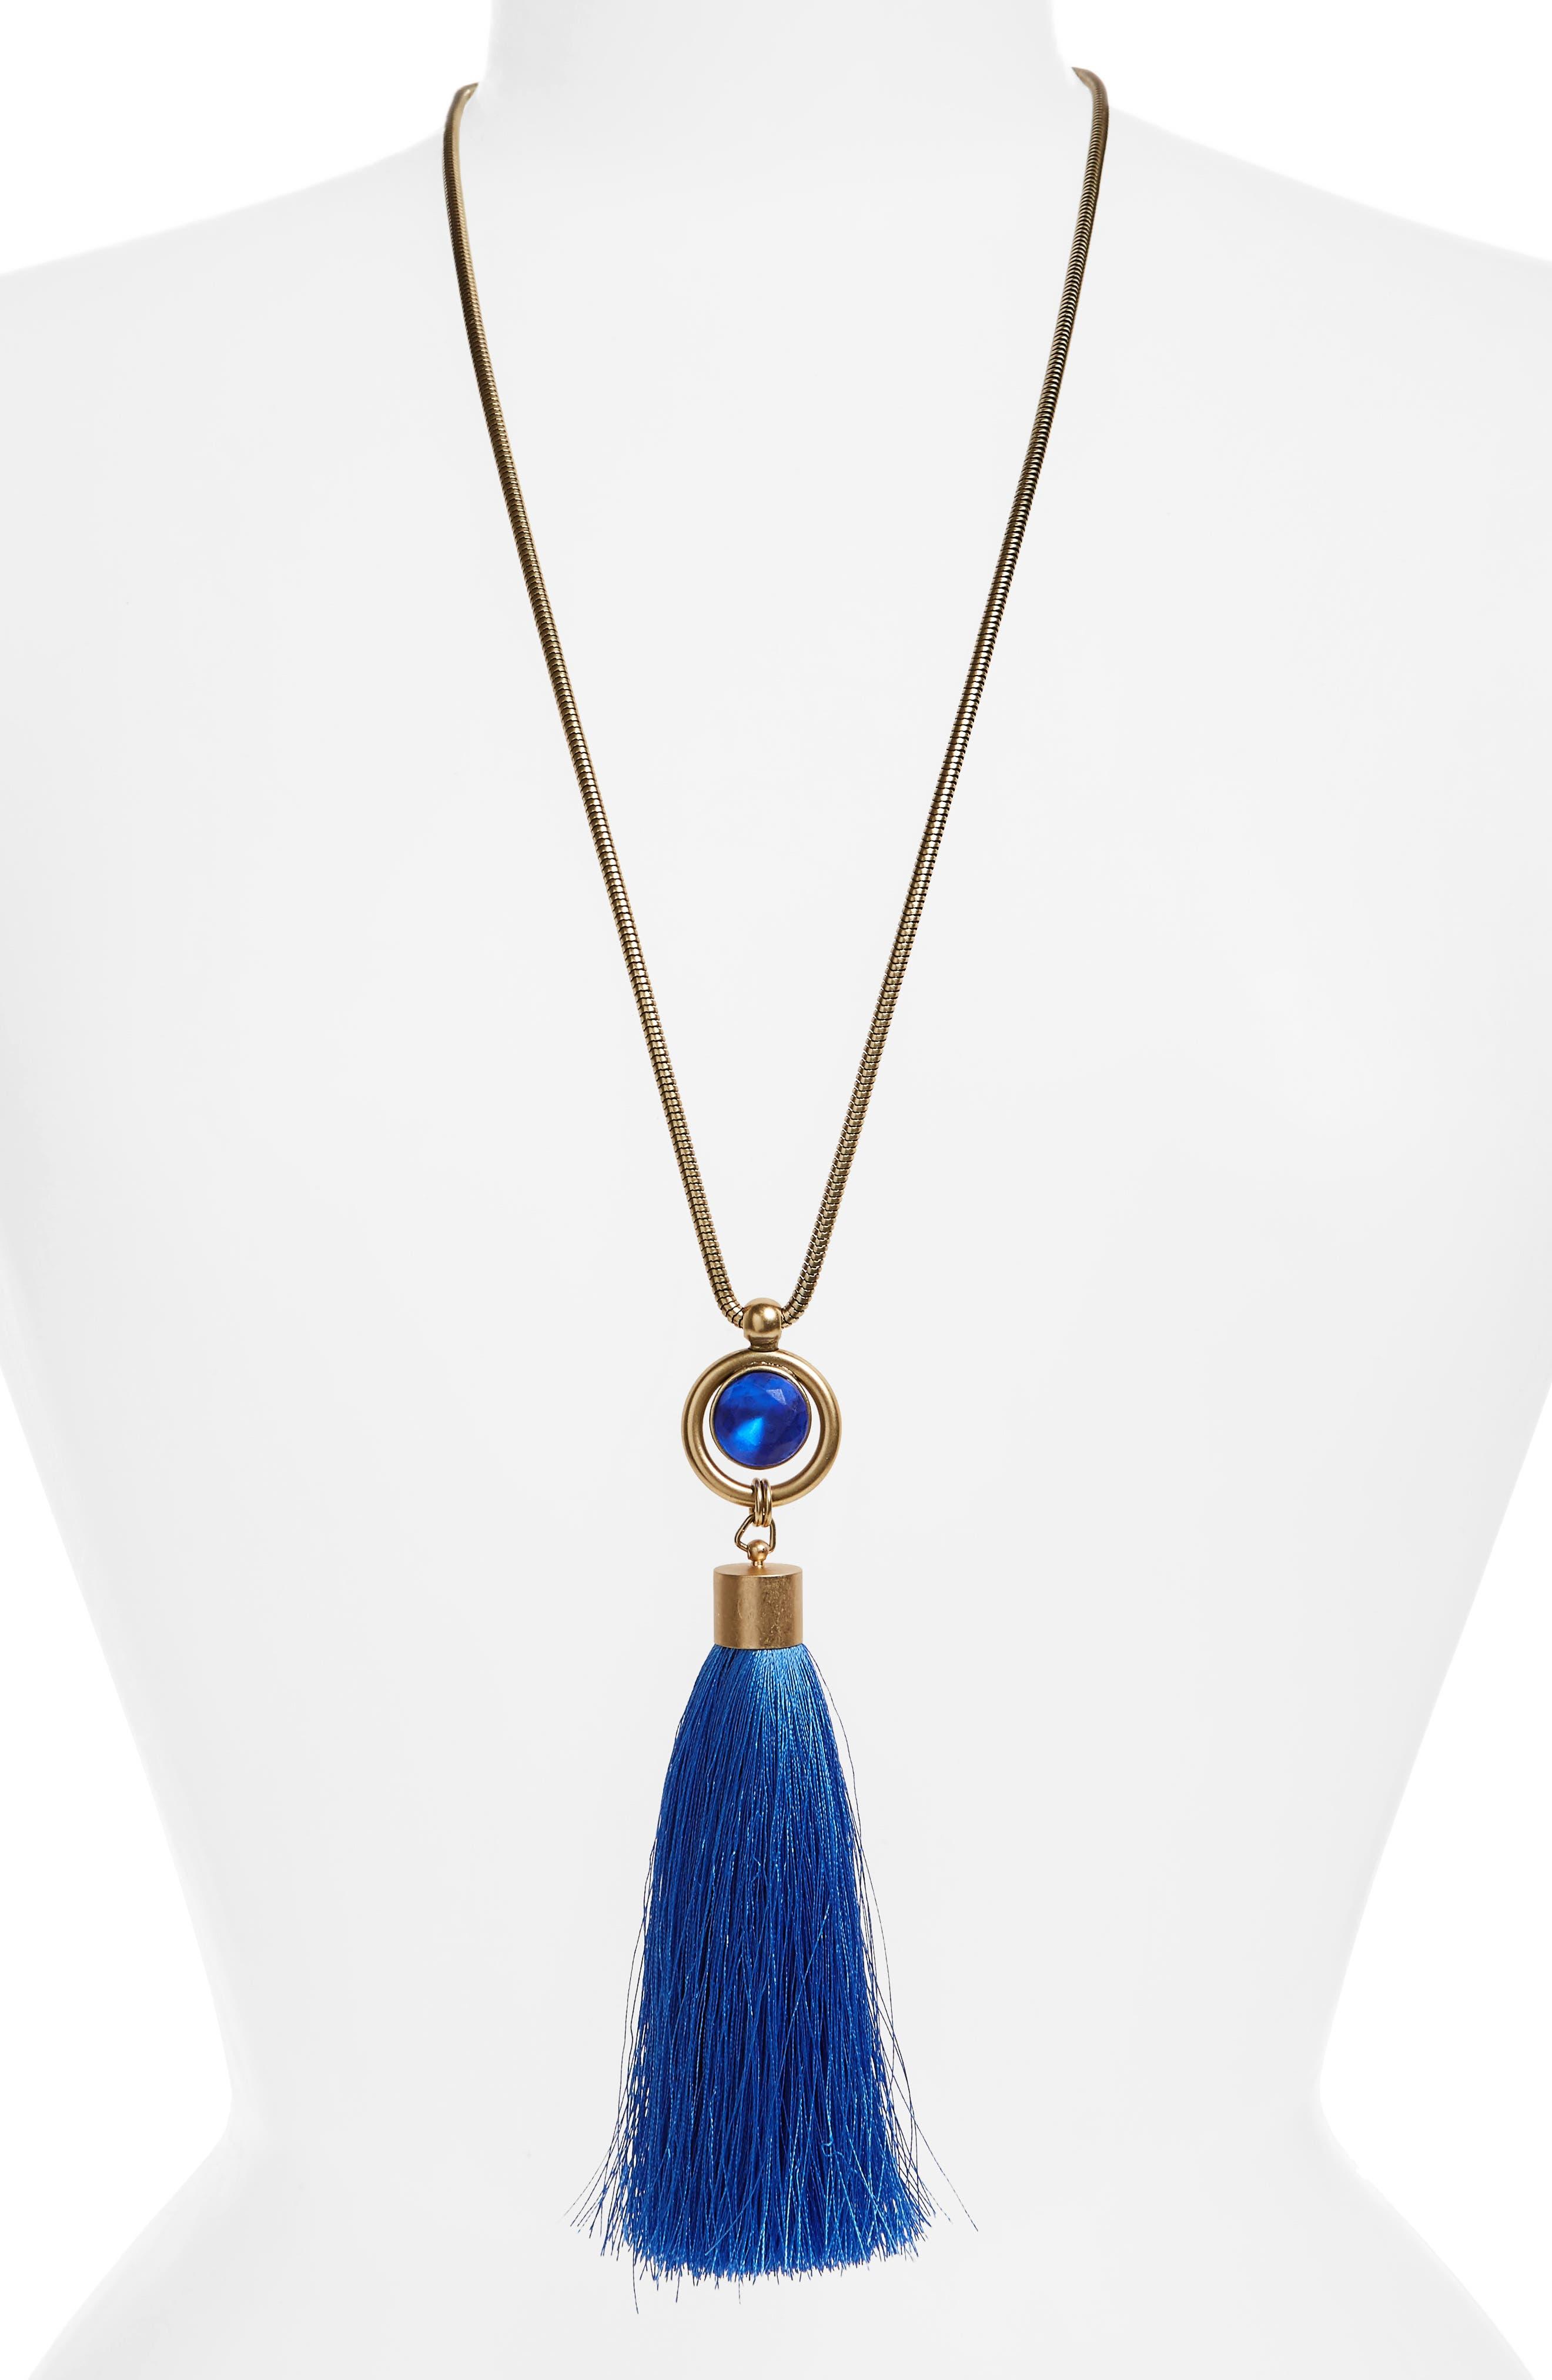 Main Image - Loren Hope Scarlet Tassel Pendant Necklace